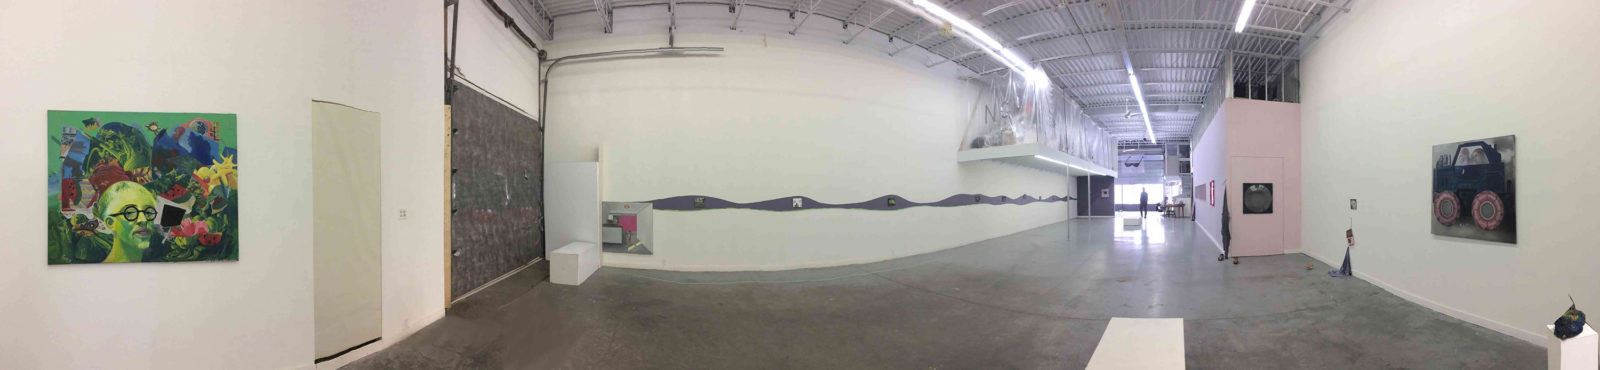 long installation view Gon Bregu